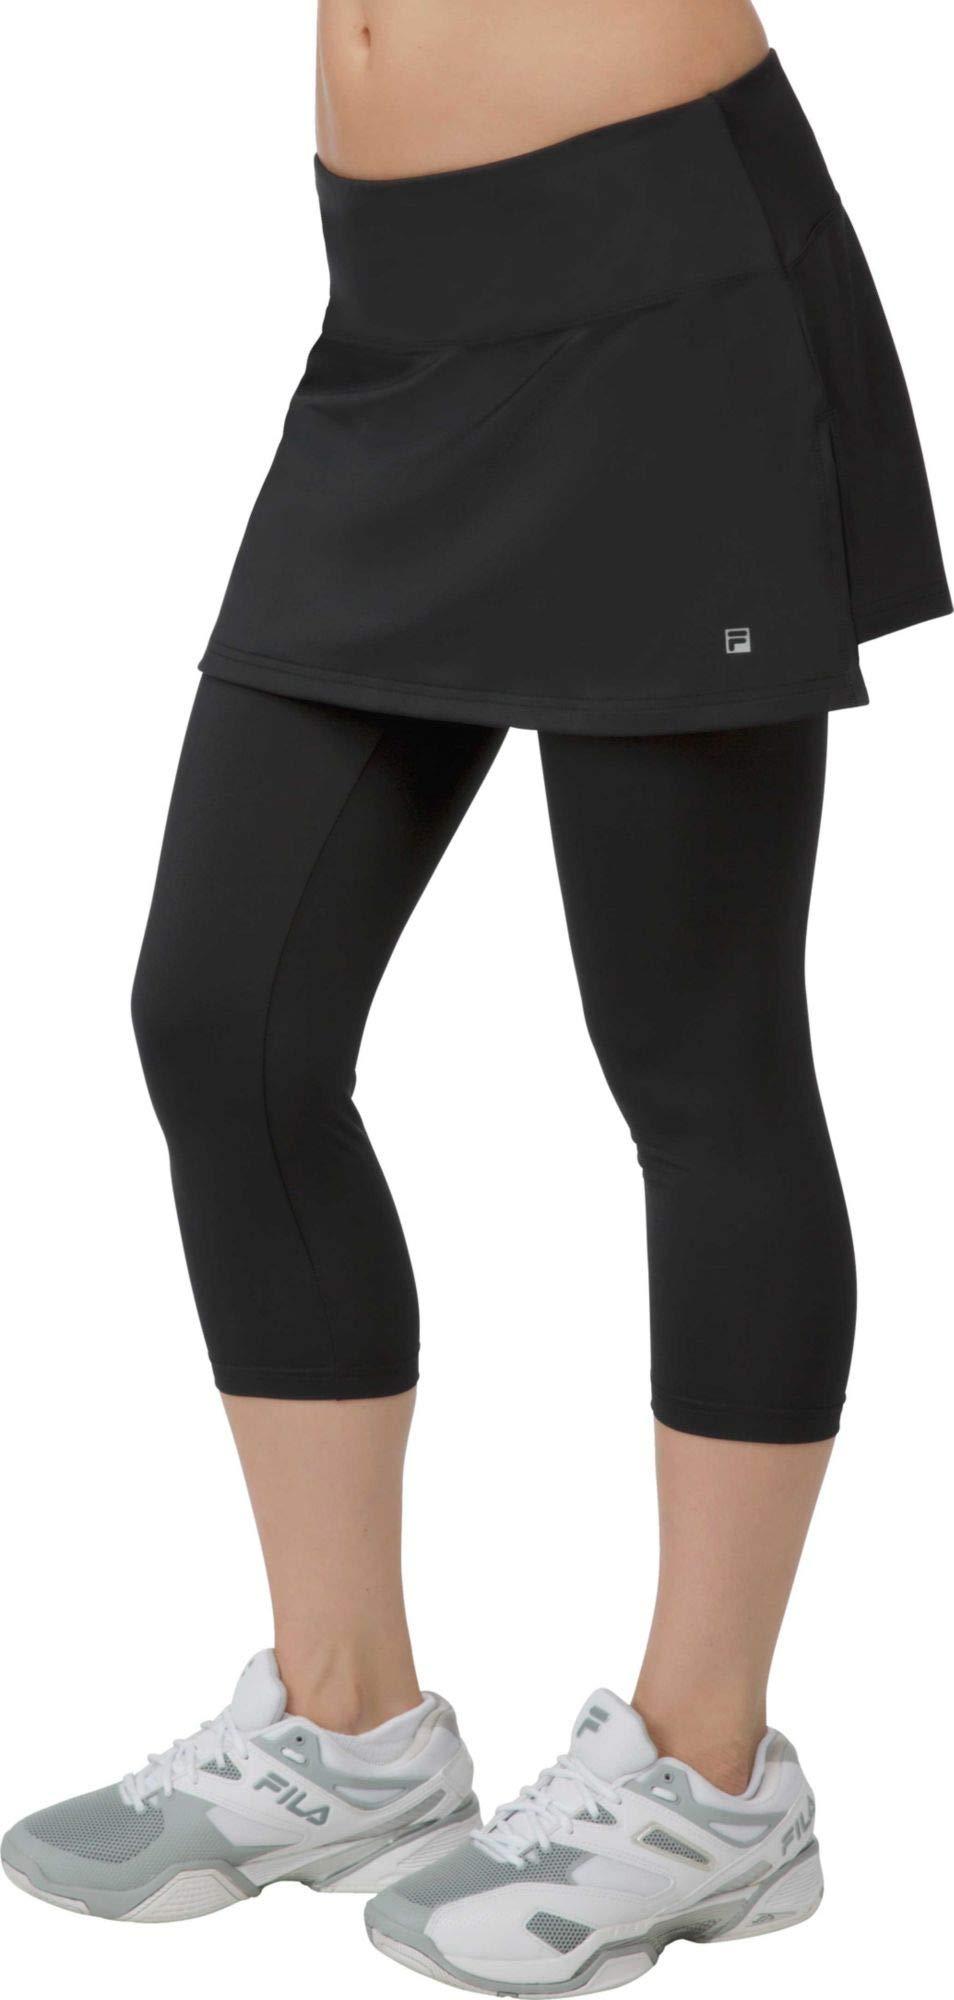 Fila Women's Skort Waistband Capri Pants XL, Black